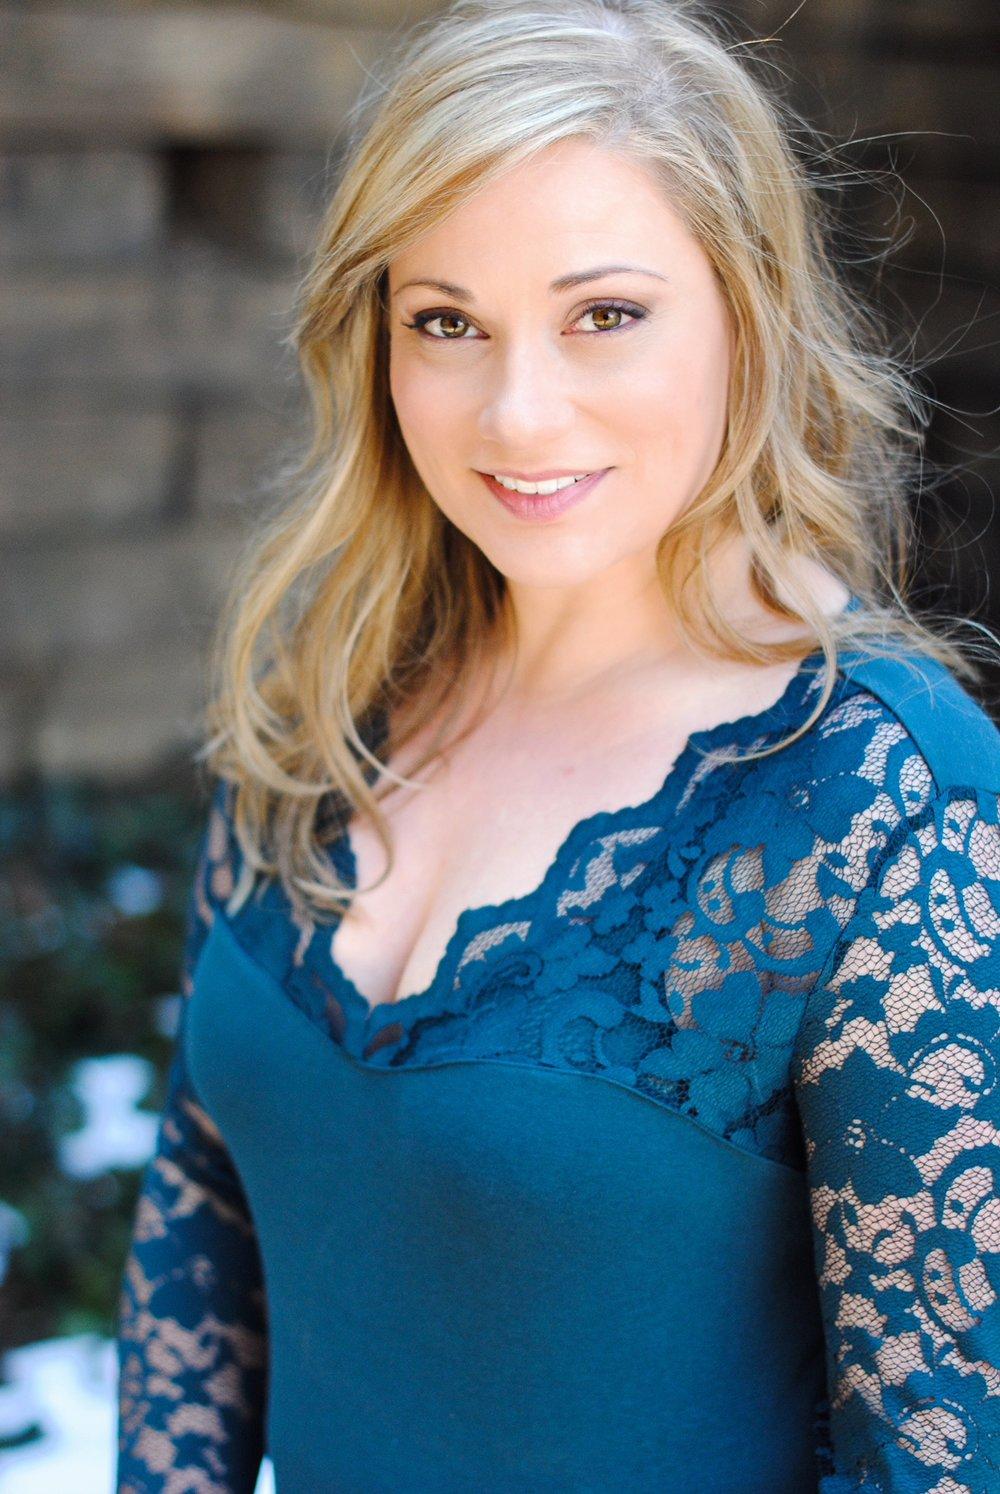 Maria Egler